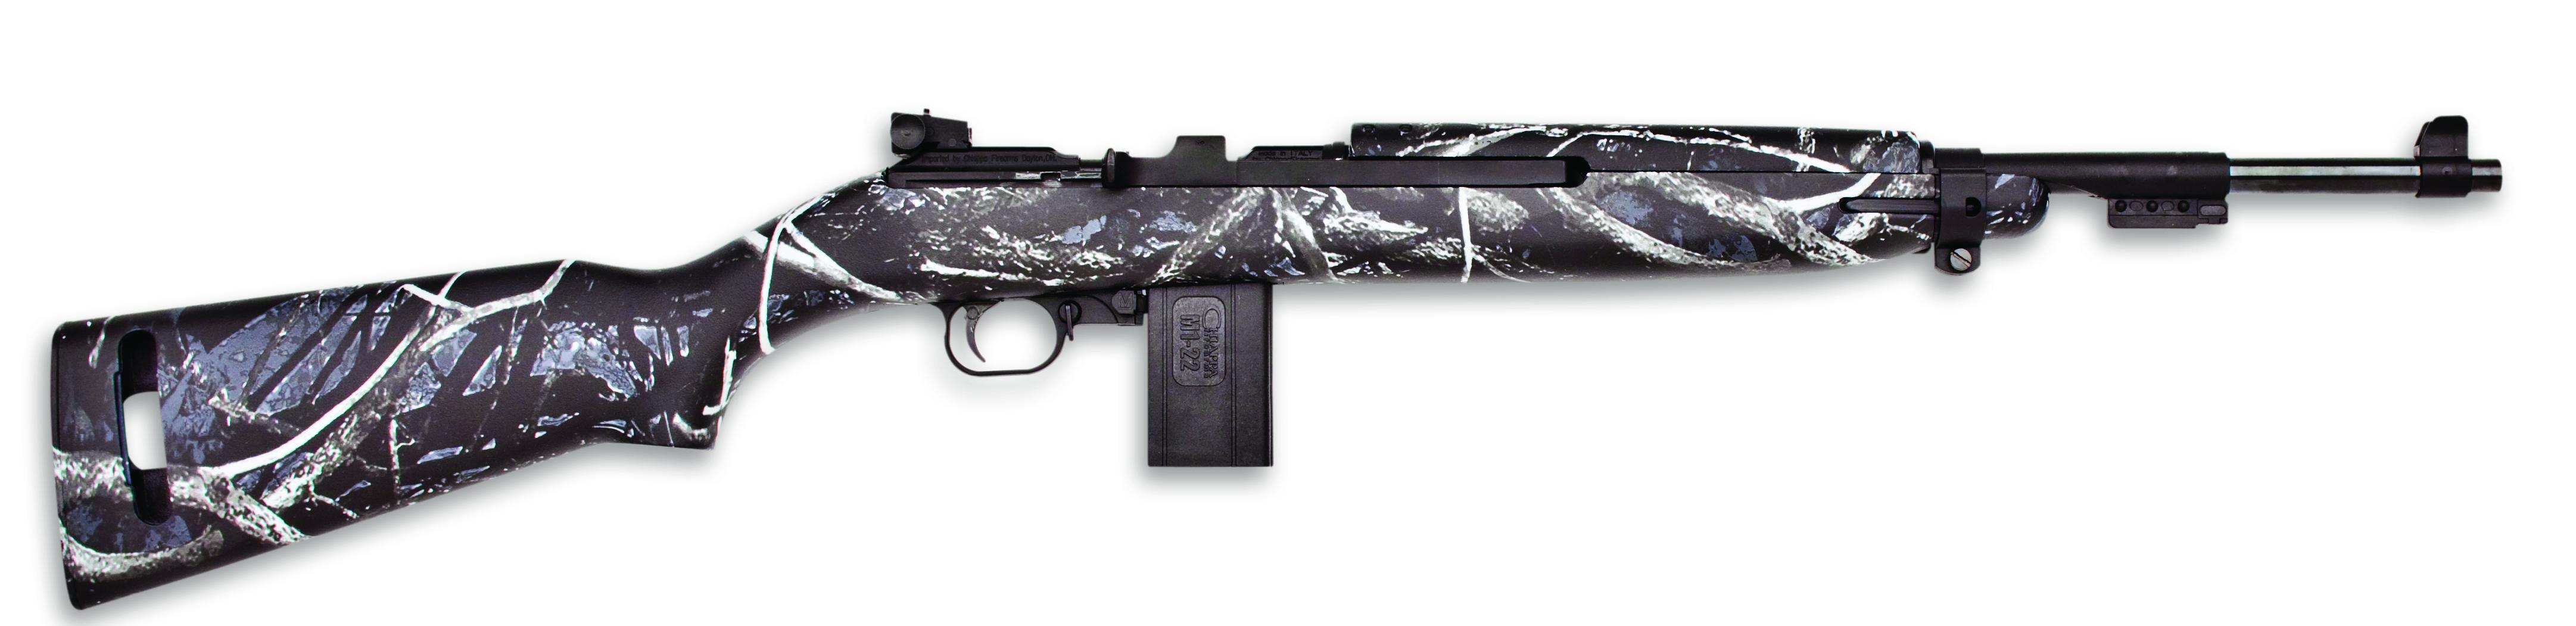 Citadel M 1 Carbine Harvest Moon 22 18 Quot